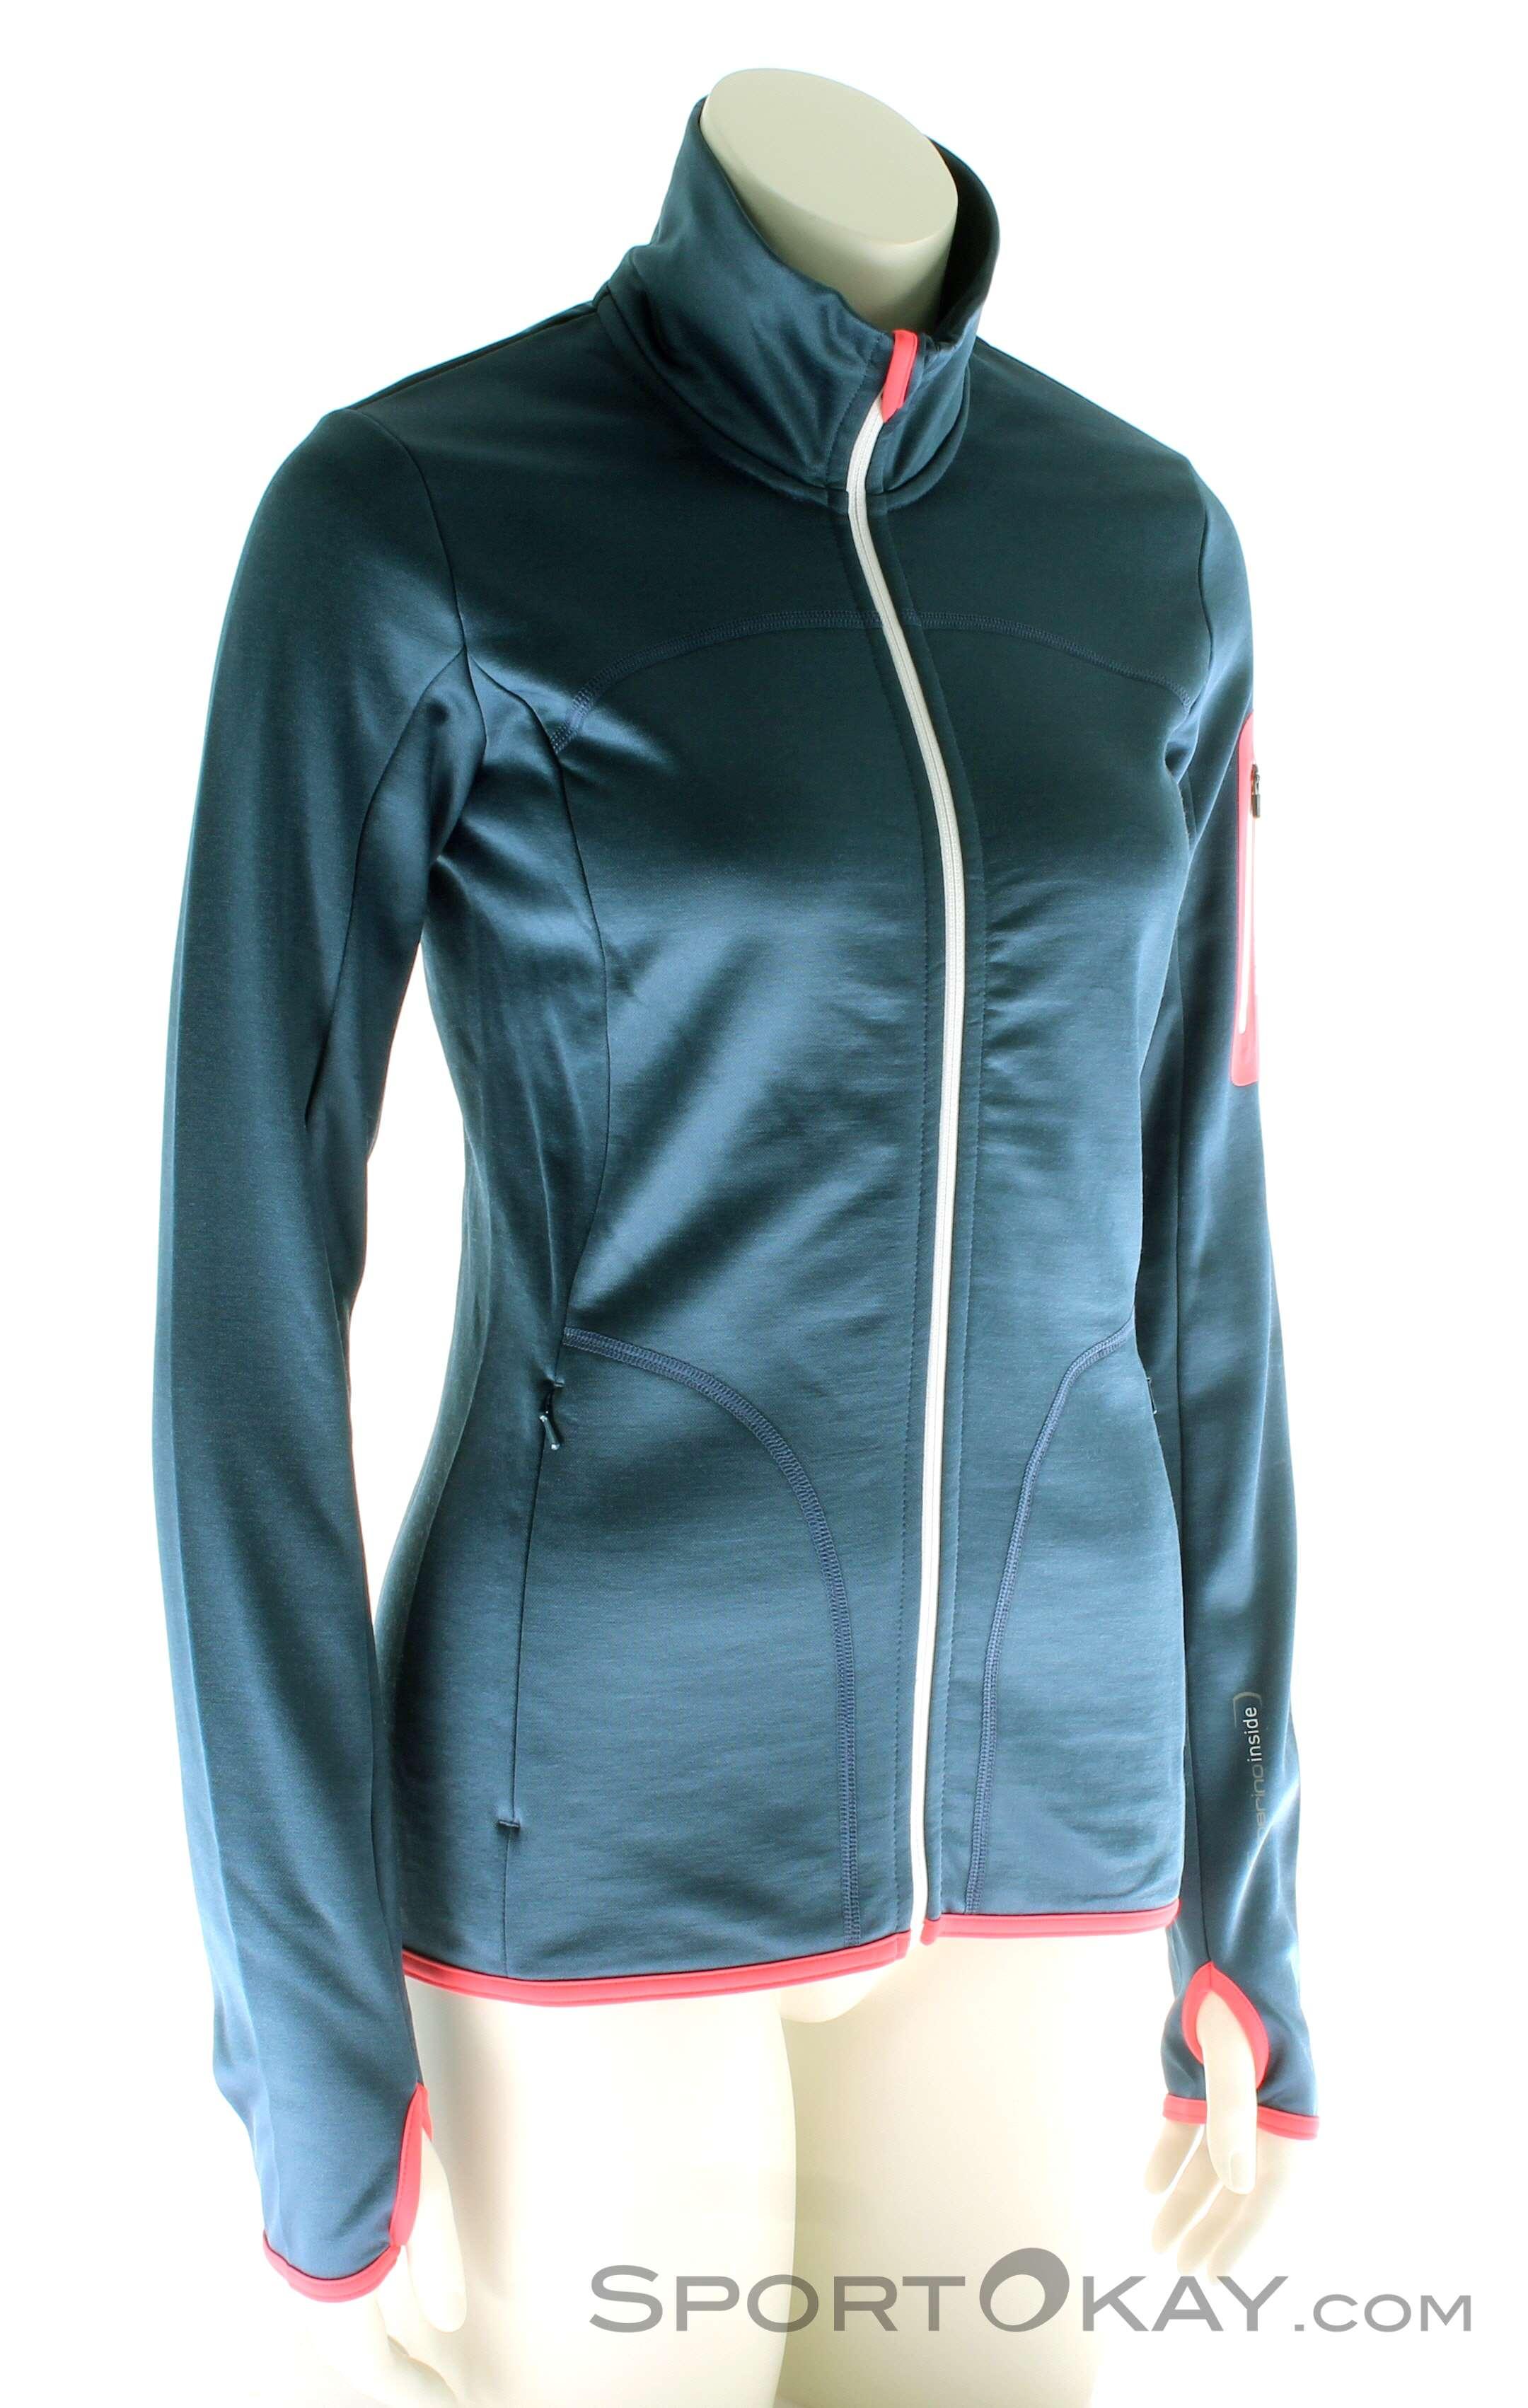 Ortovox Fleece Jacket Damen Tourensweater, Ortovox, Blau, , Damen, 0016-10580, 5637562638, 4250875282223, N1-01.jpg